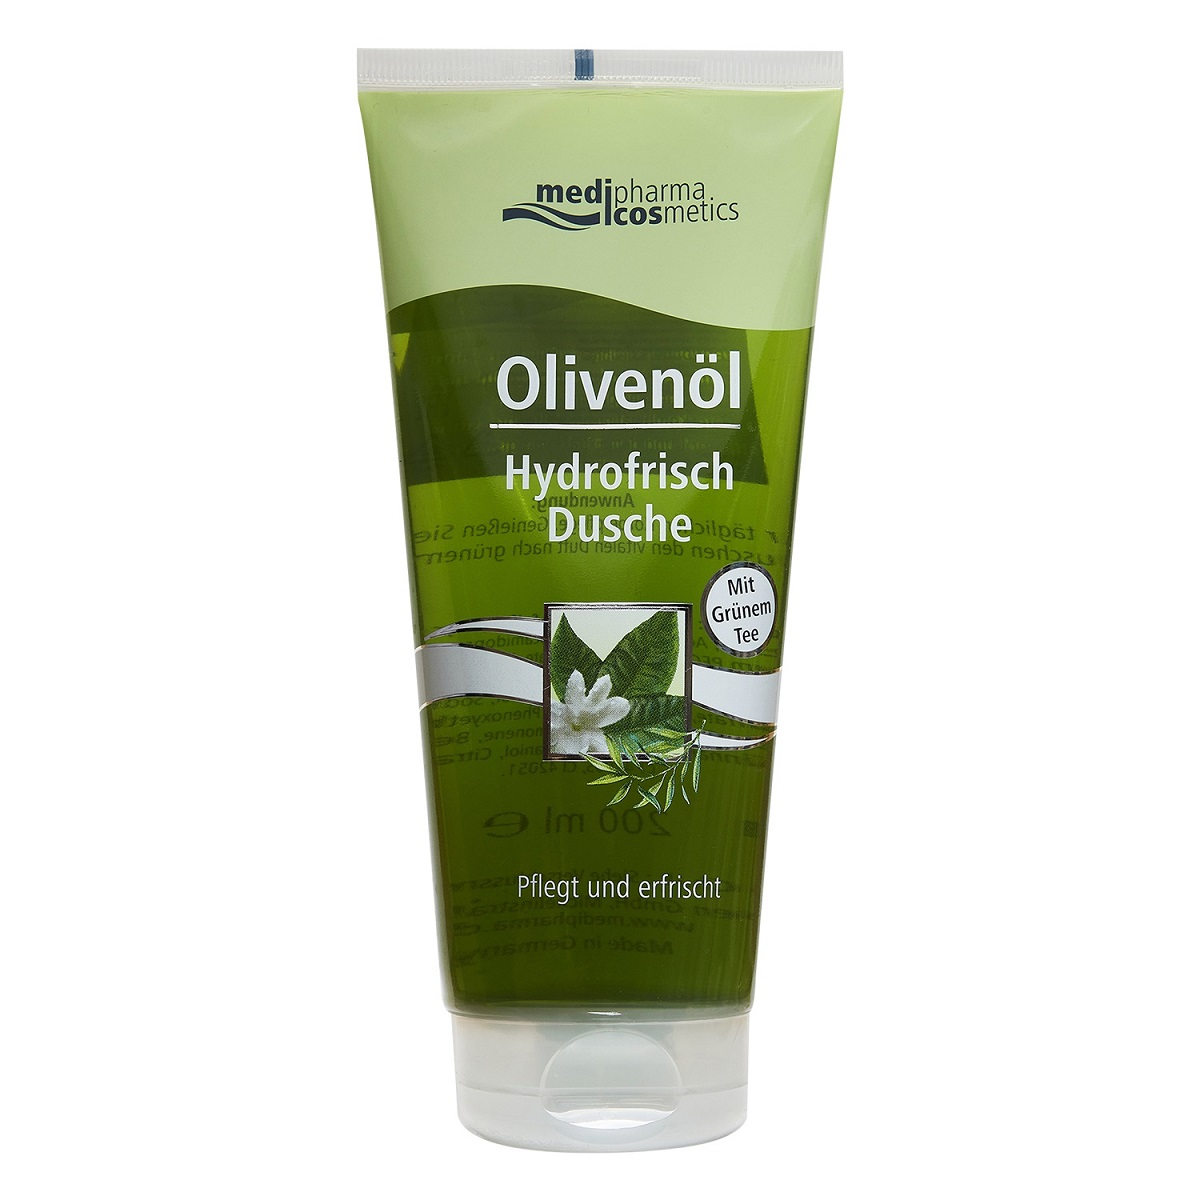 Medipharma Cosmetics Гель для душа Зеленый чай 200 мл (Medipharma Cosmetics, Olivenol) medipharma cosmetics гель для